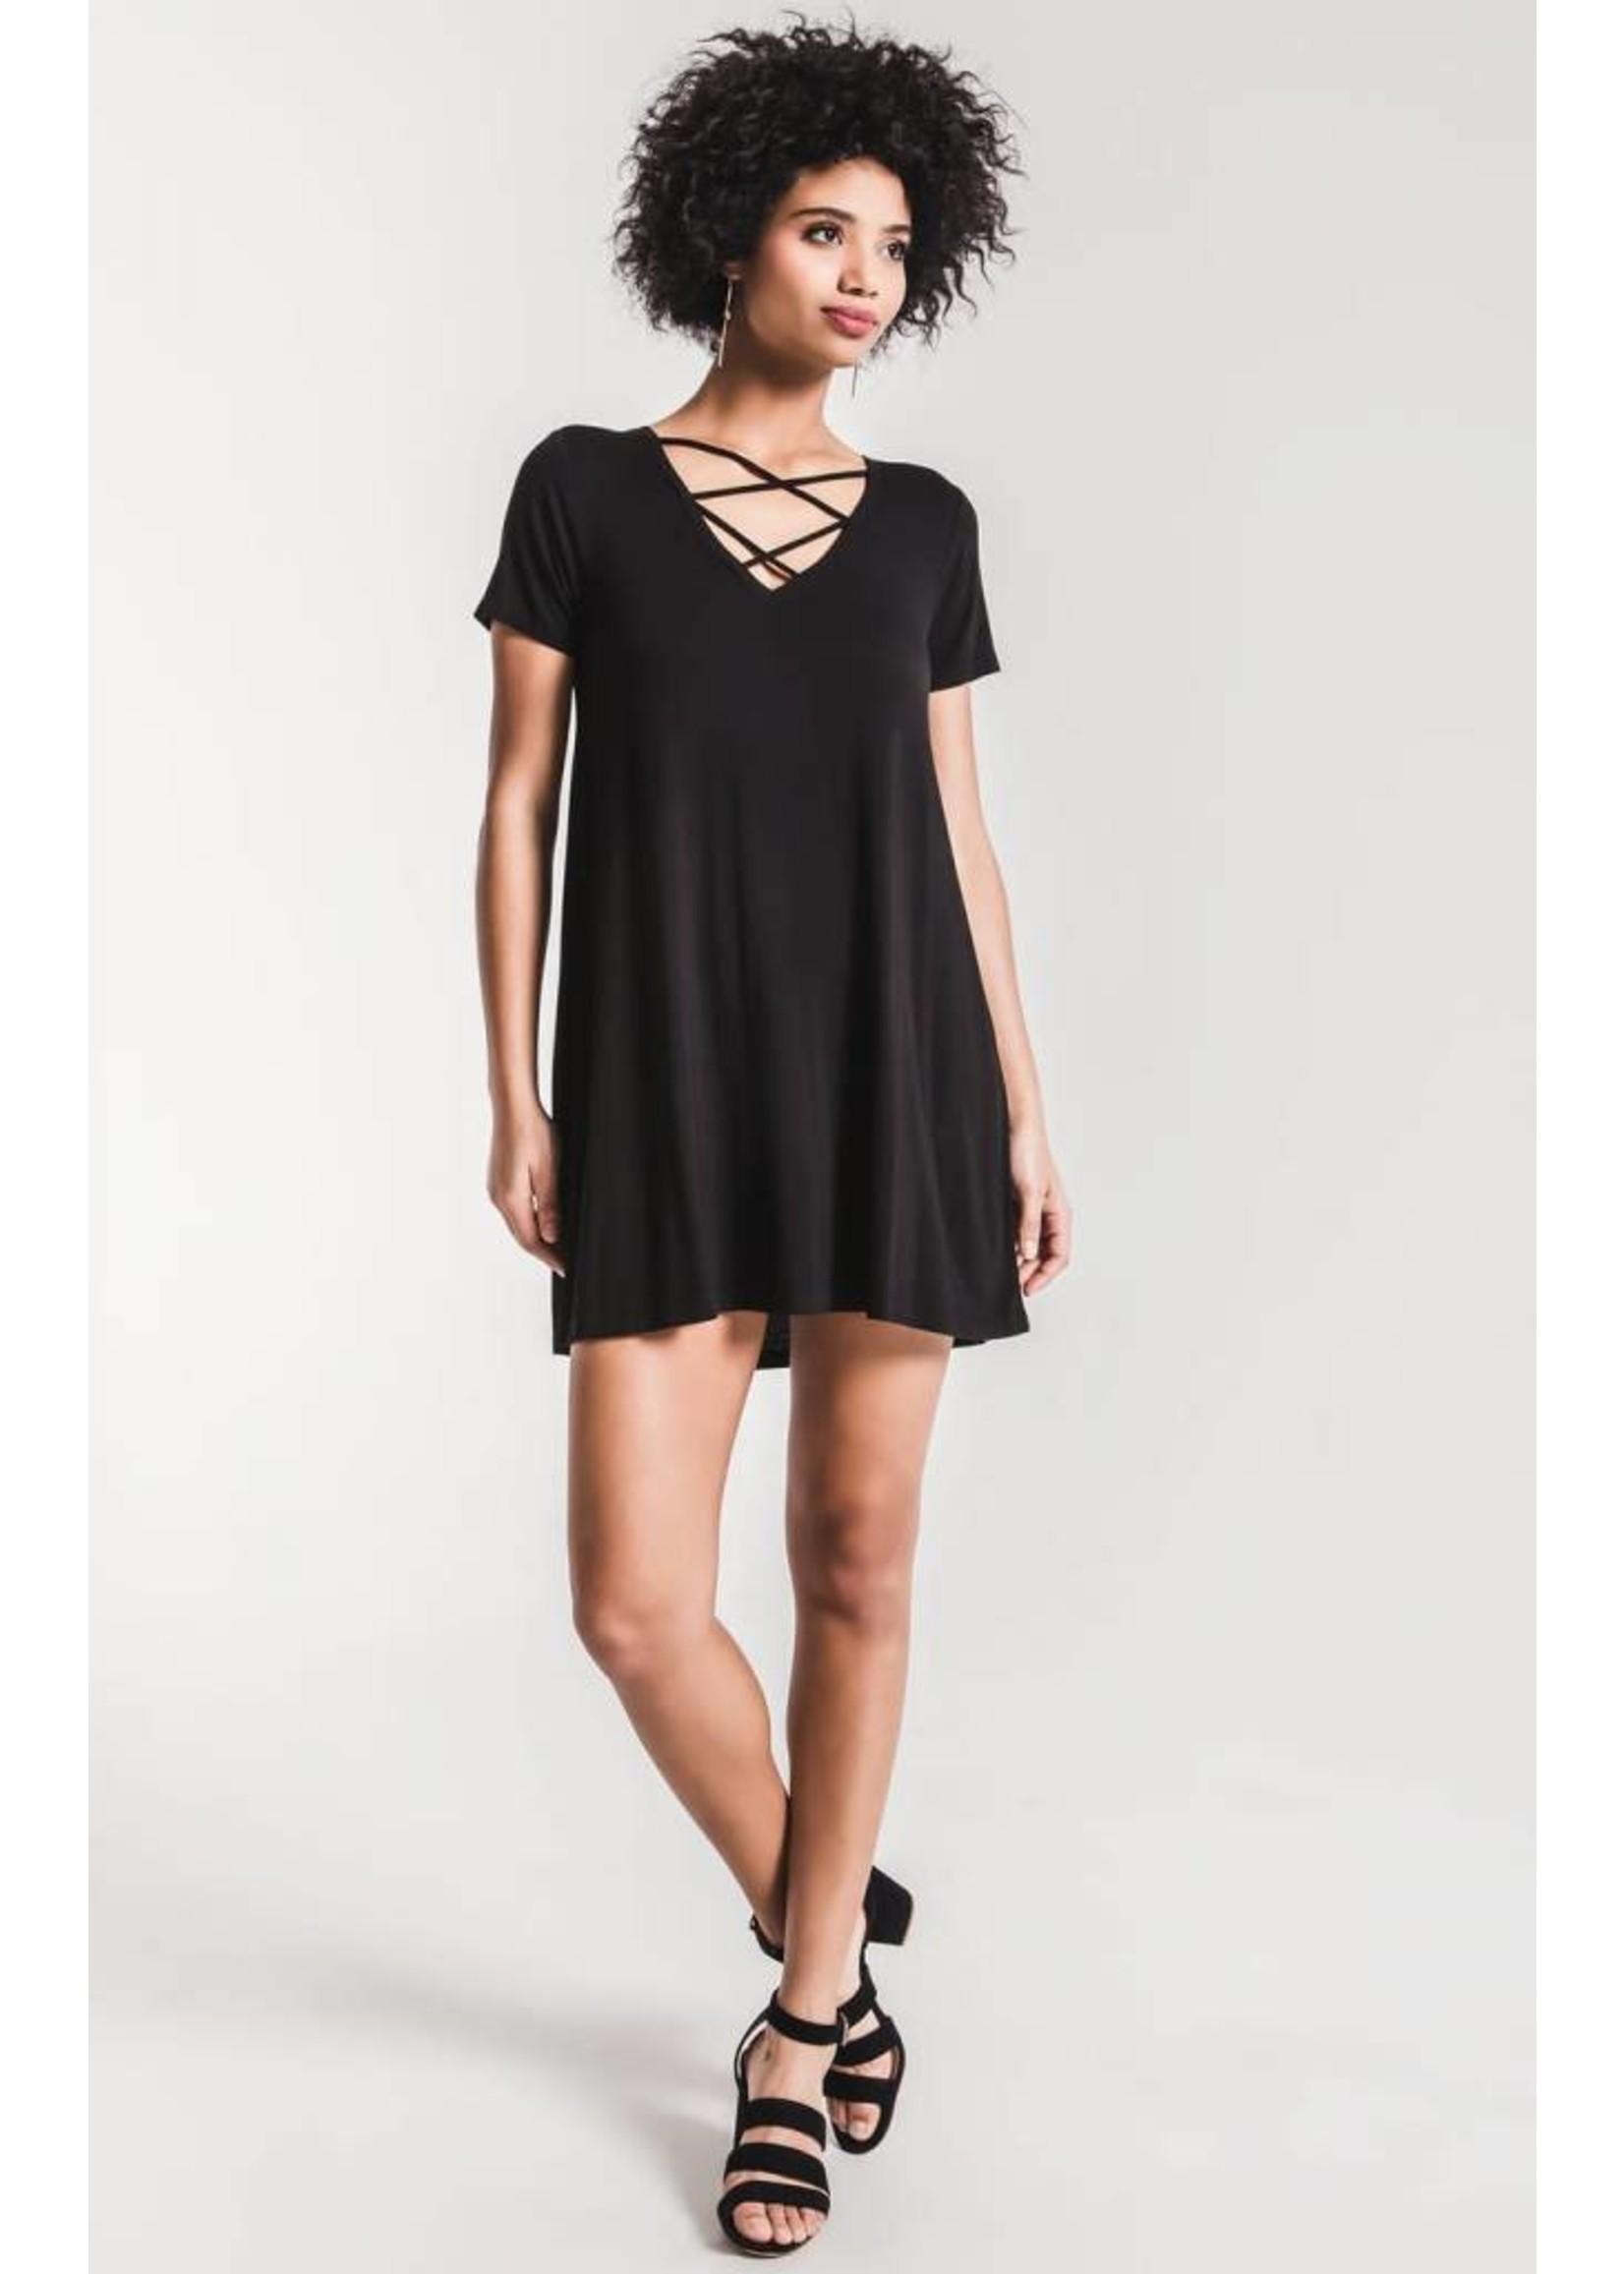 Cross Front Tee Dress- black